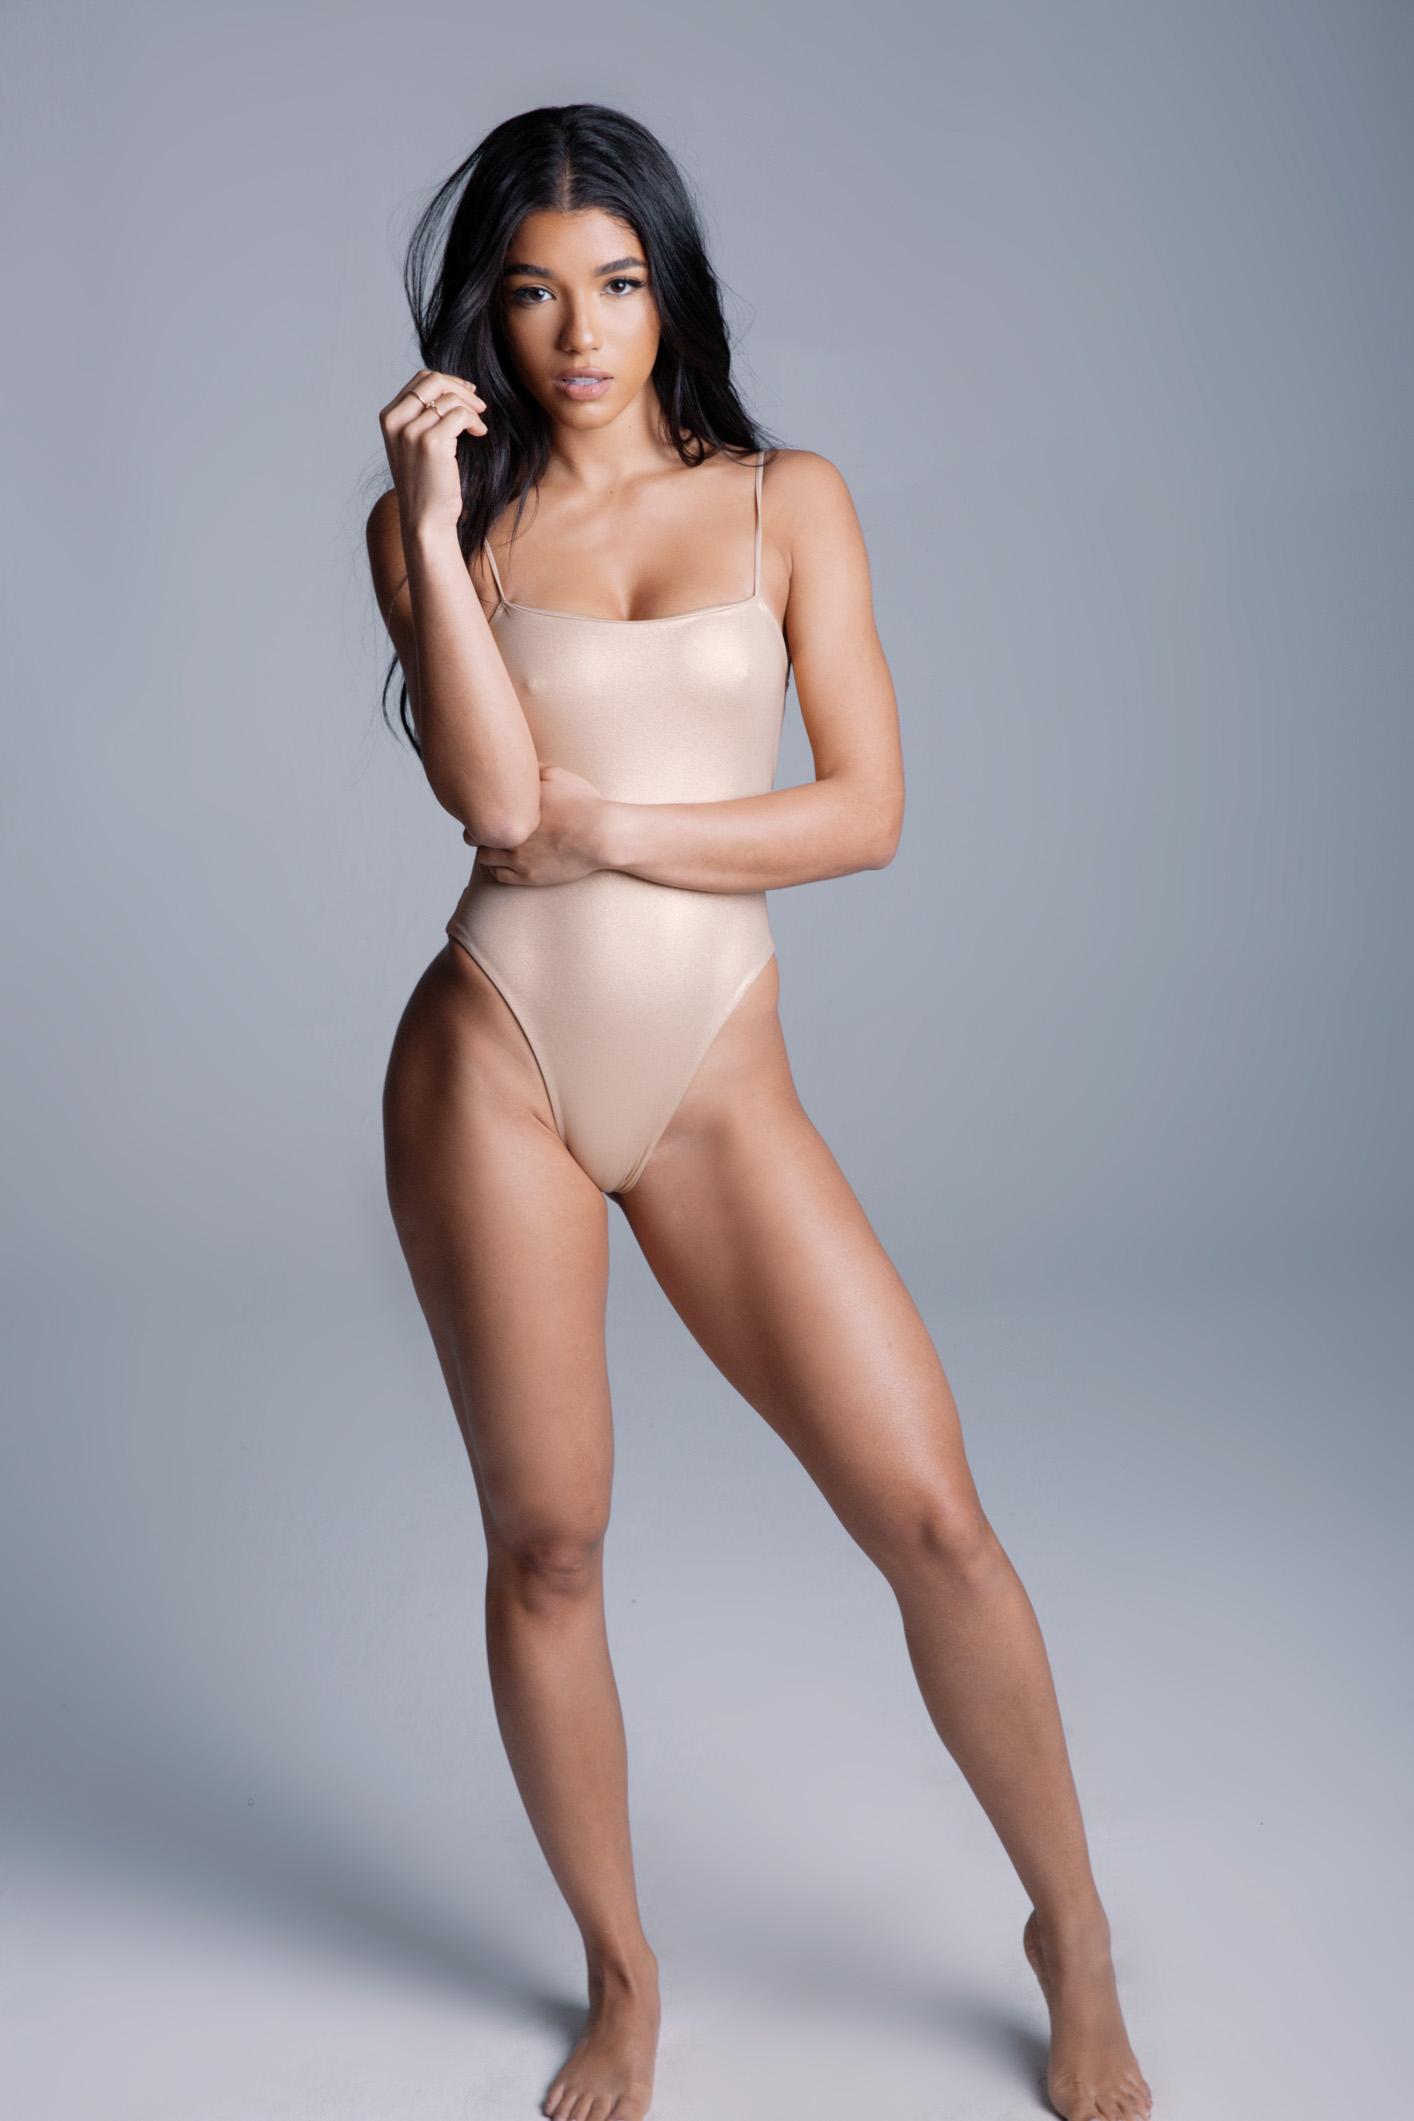 Yovanna Ventura for Beach Bunny Swimwear